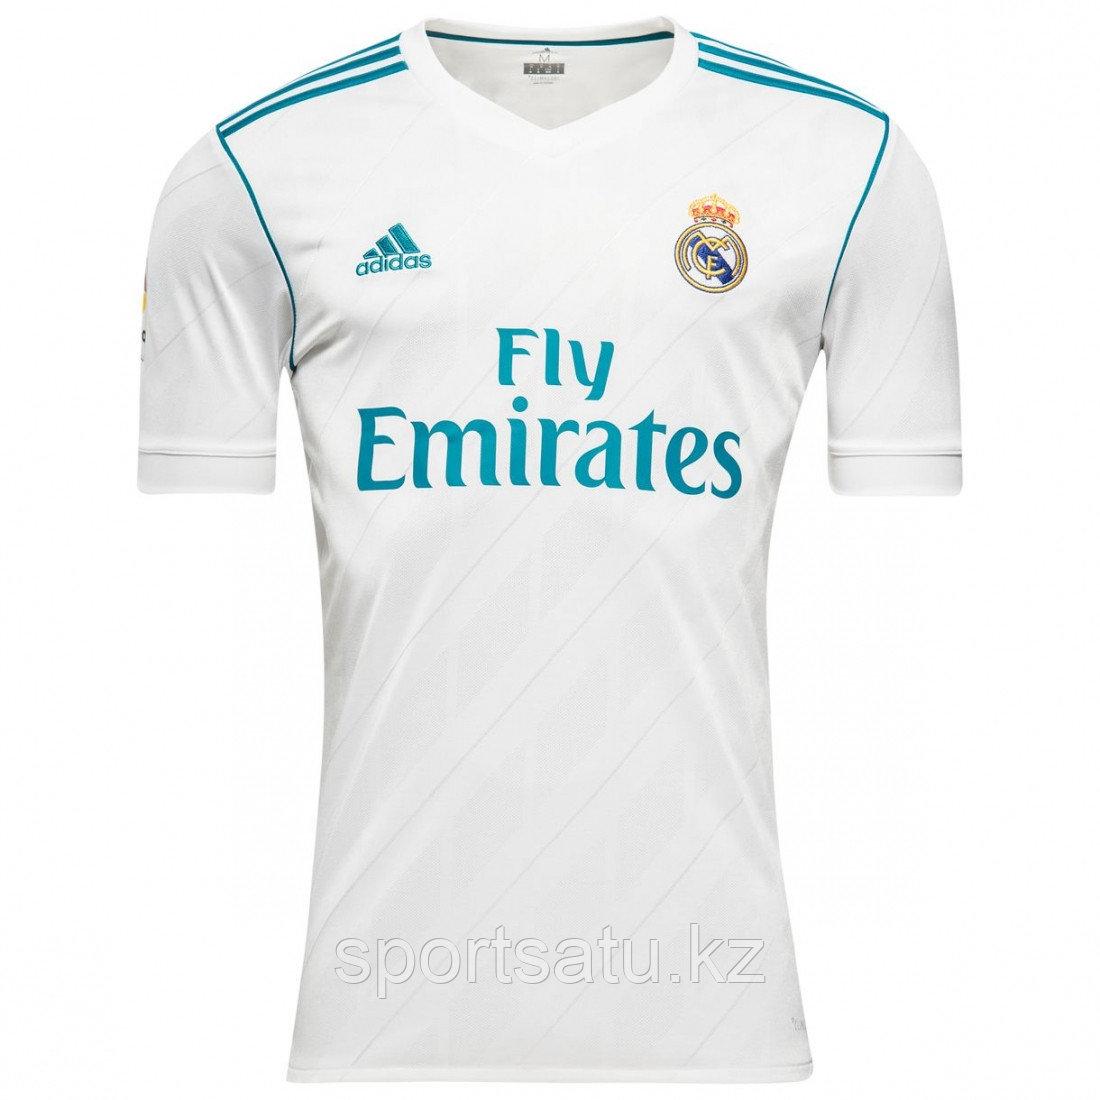 Футболка Реал Мадрид сезона 2017-18 домашняя